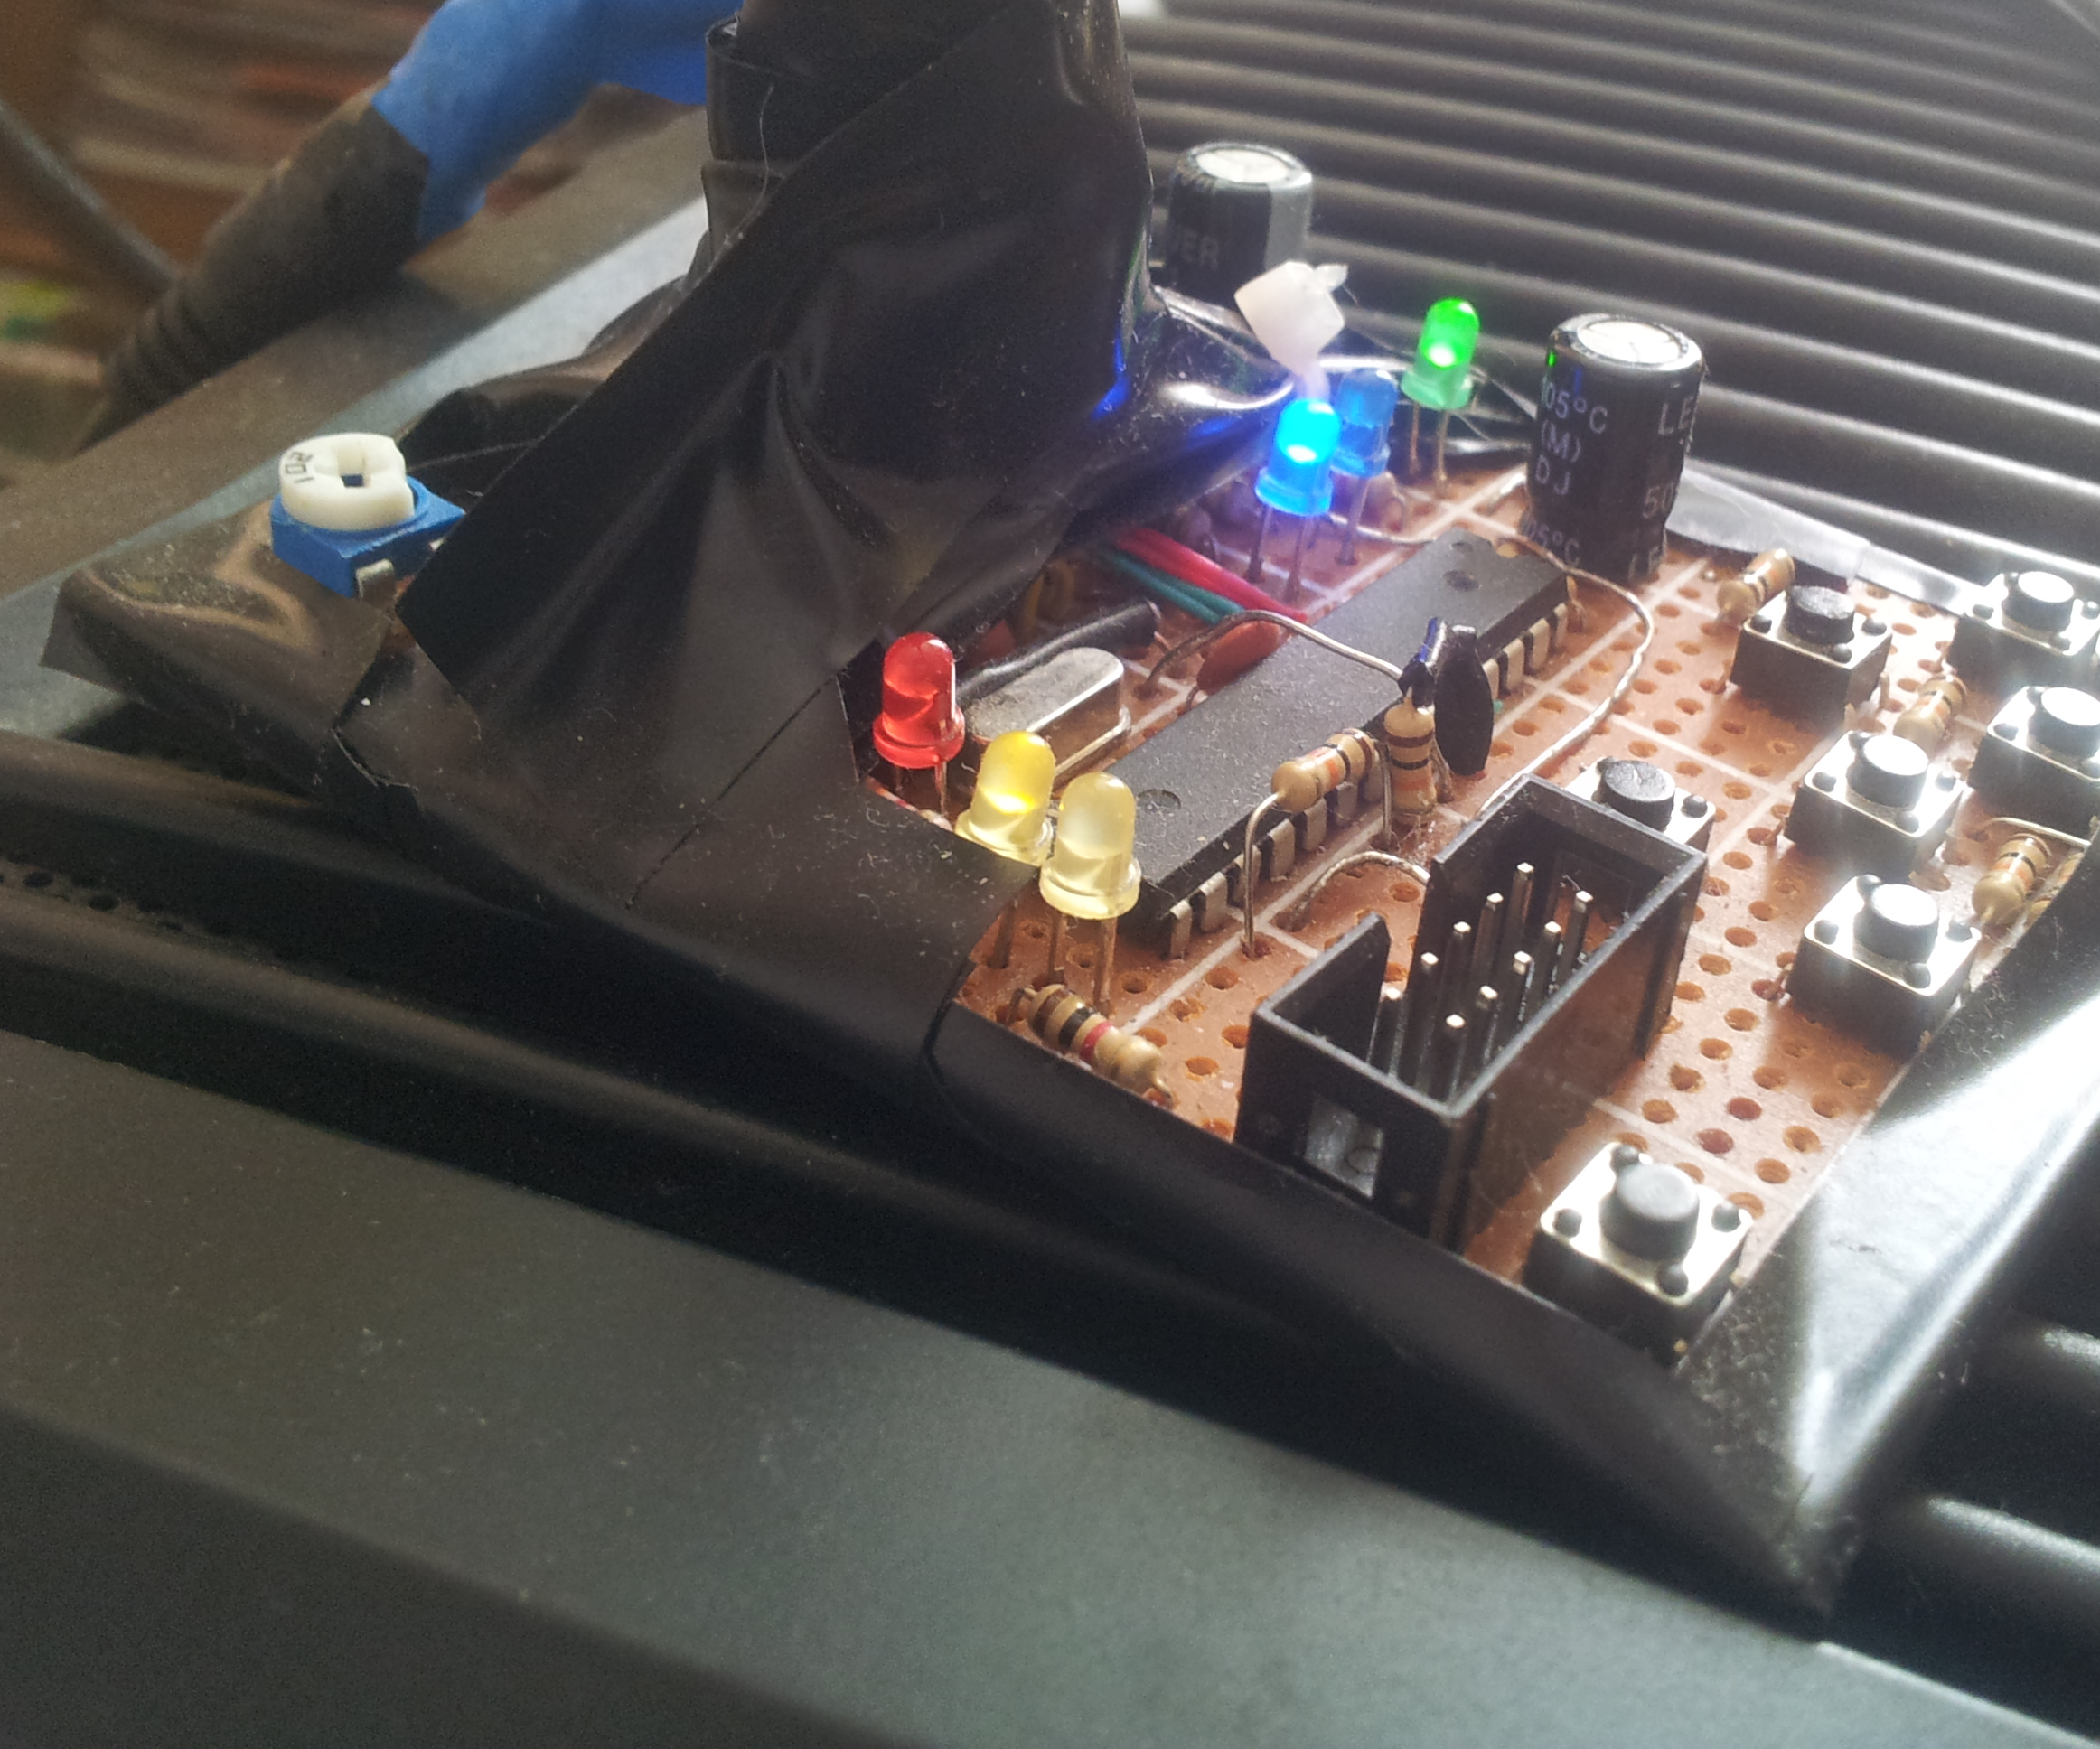 Alternately Occluding Dichoptic  Modifier of Stereoscopic Transmission [ATmega328P+HEF4053B VGA Superimposer]